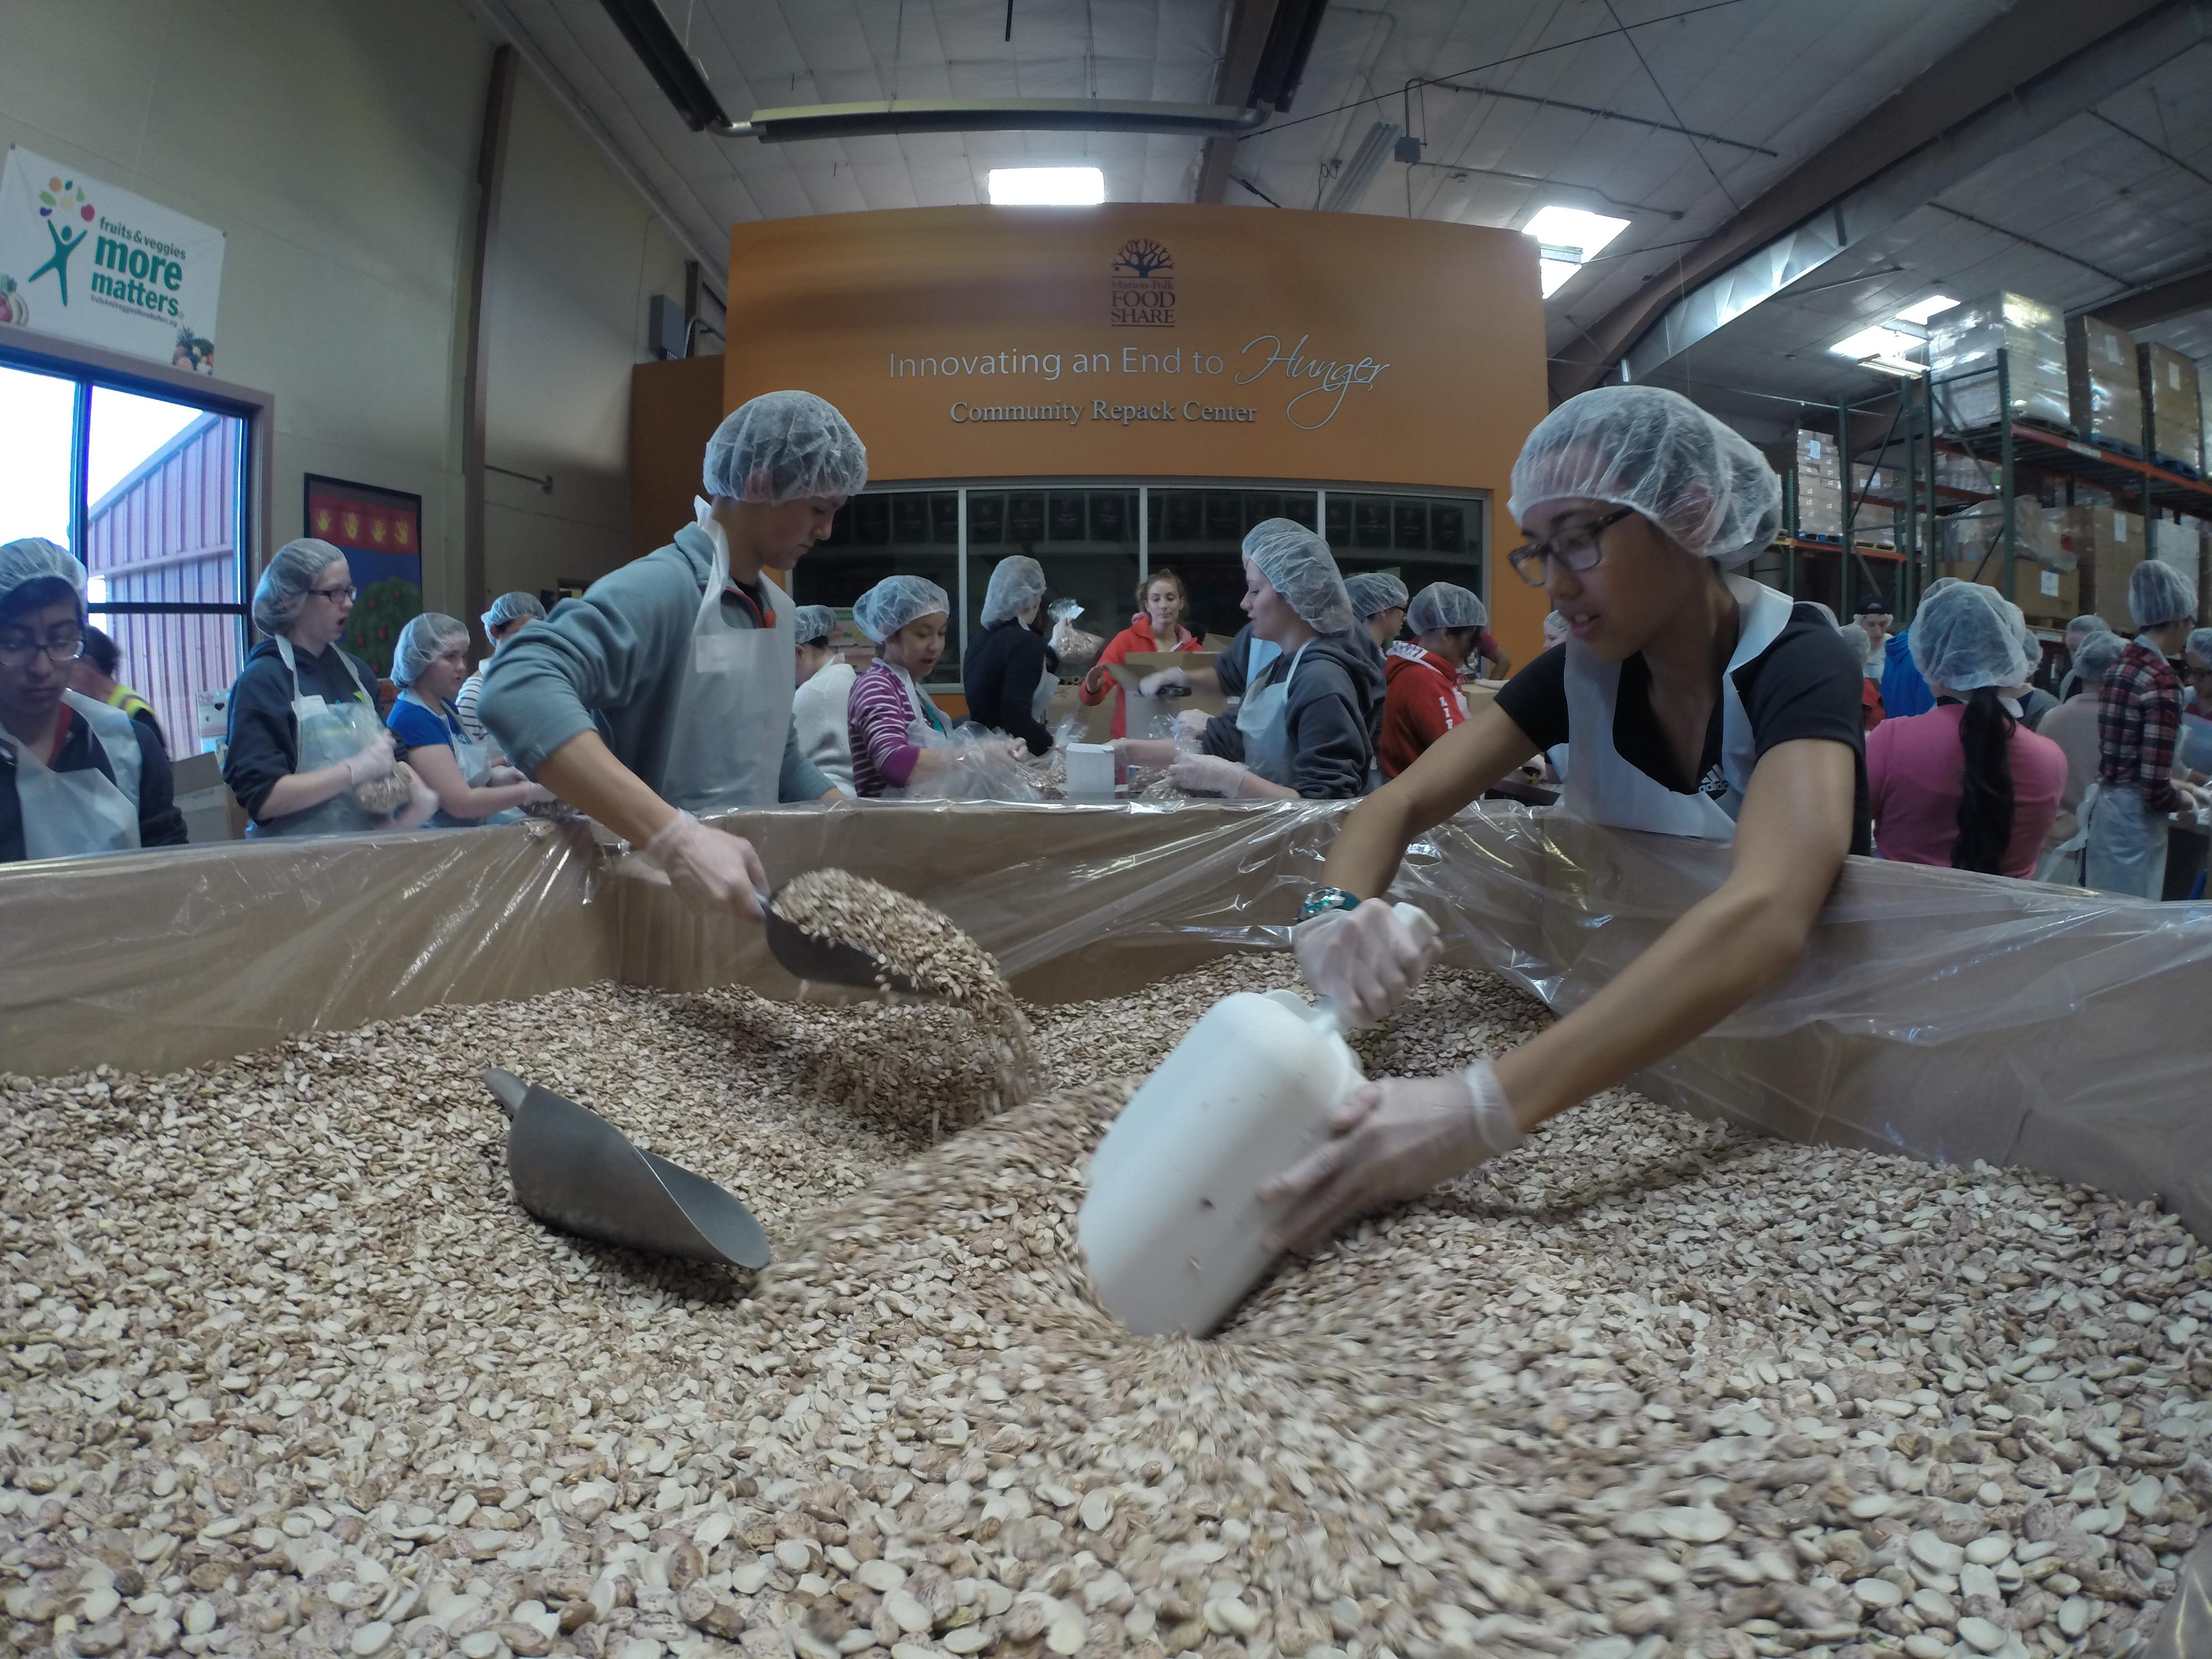 Marion-Polk Foodshare